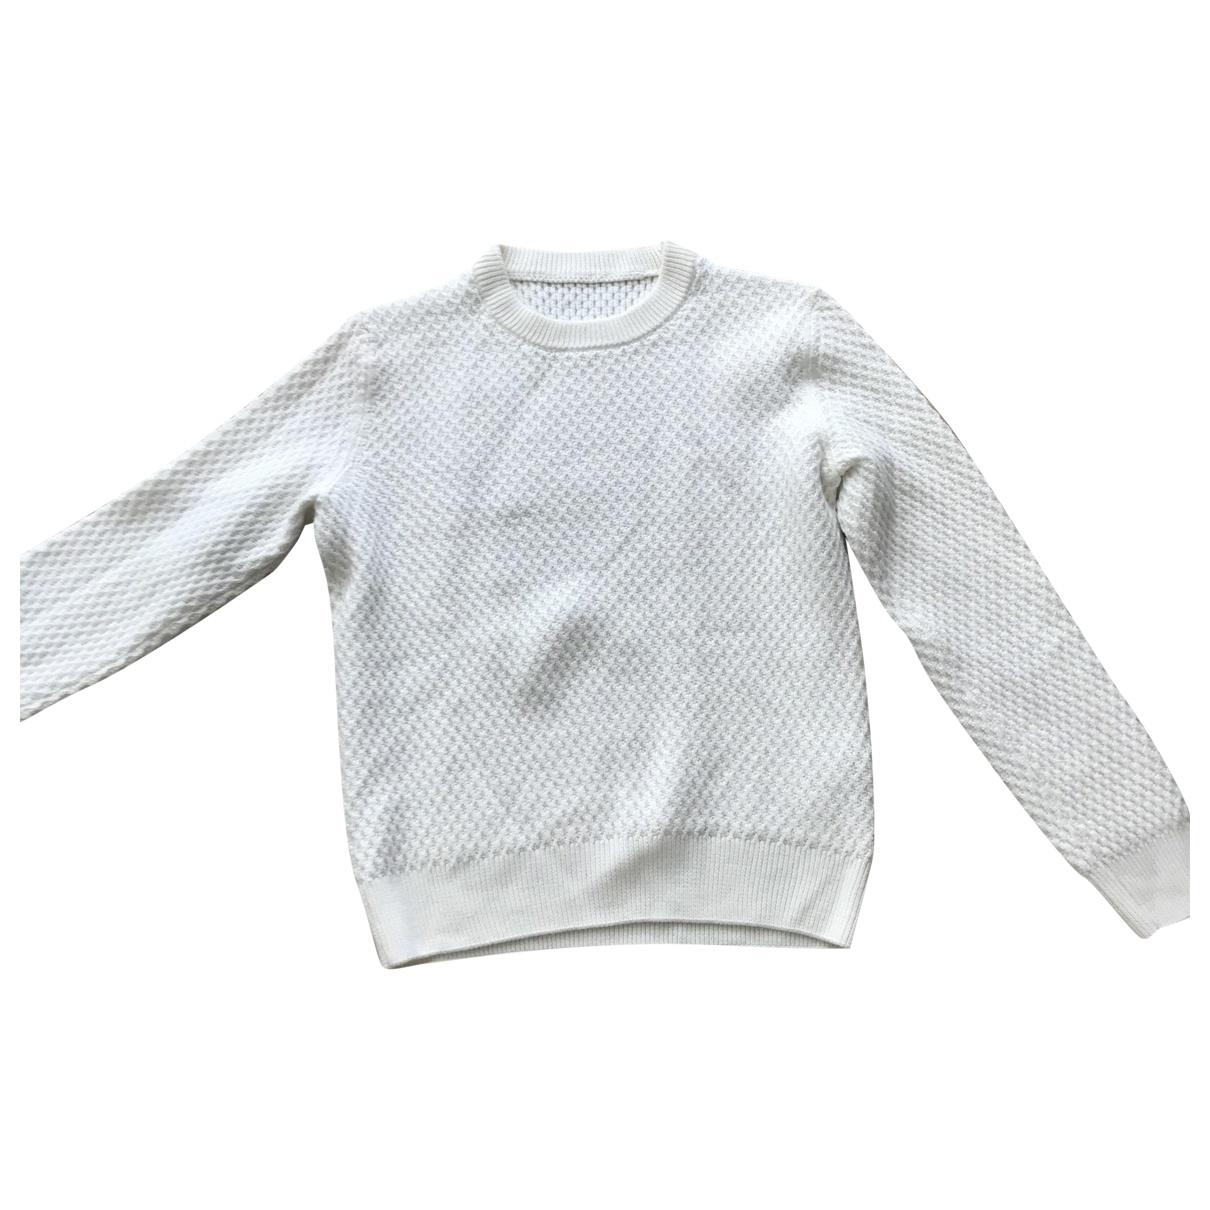 Sandro \N White Wool Knitwear & Sweatshirts for Men M International